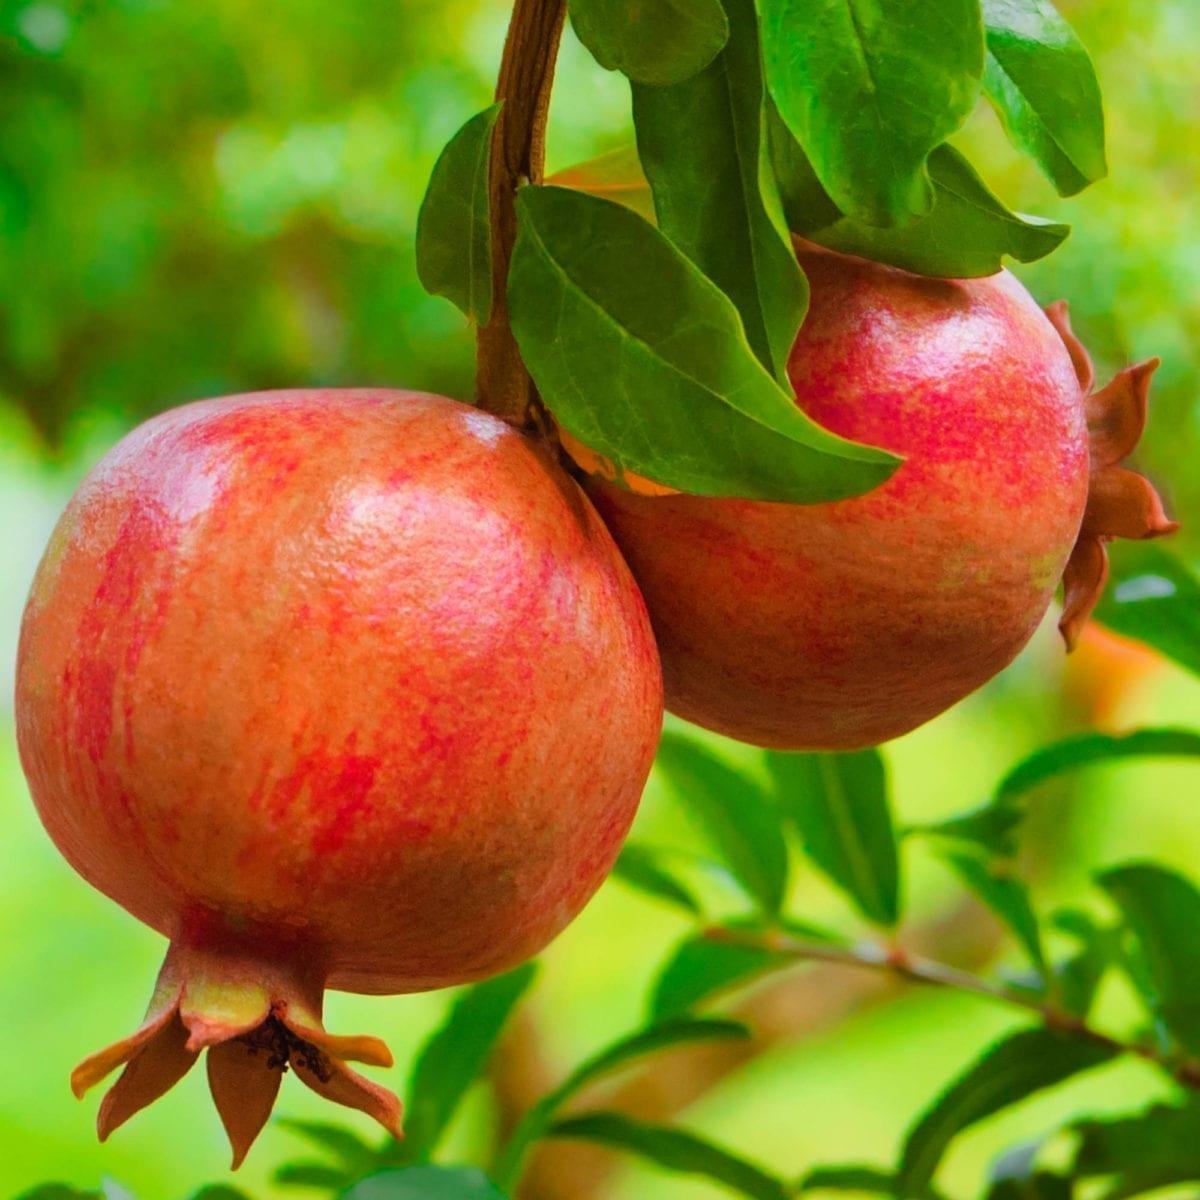 boskoopsefruitbomen | granaatappel detailfoto